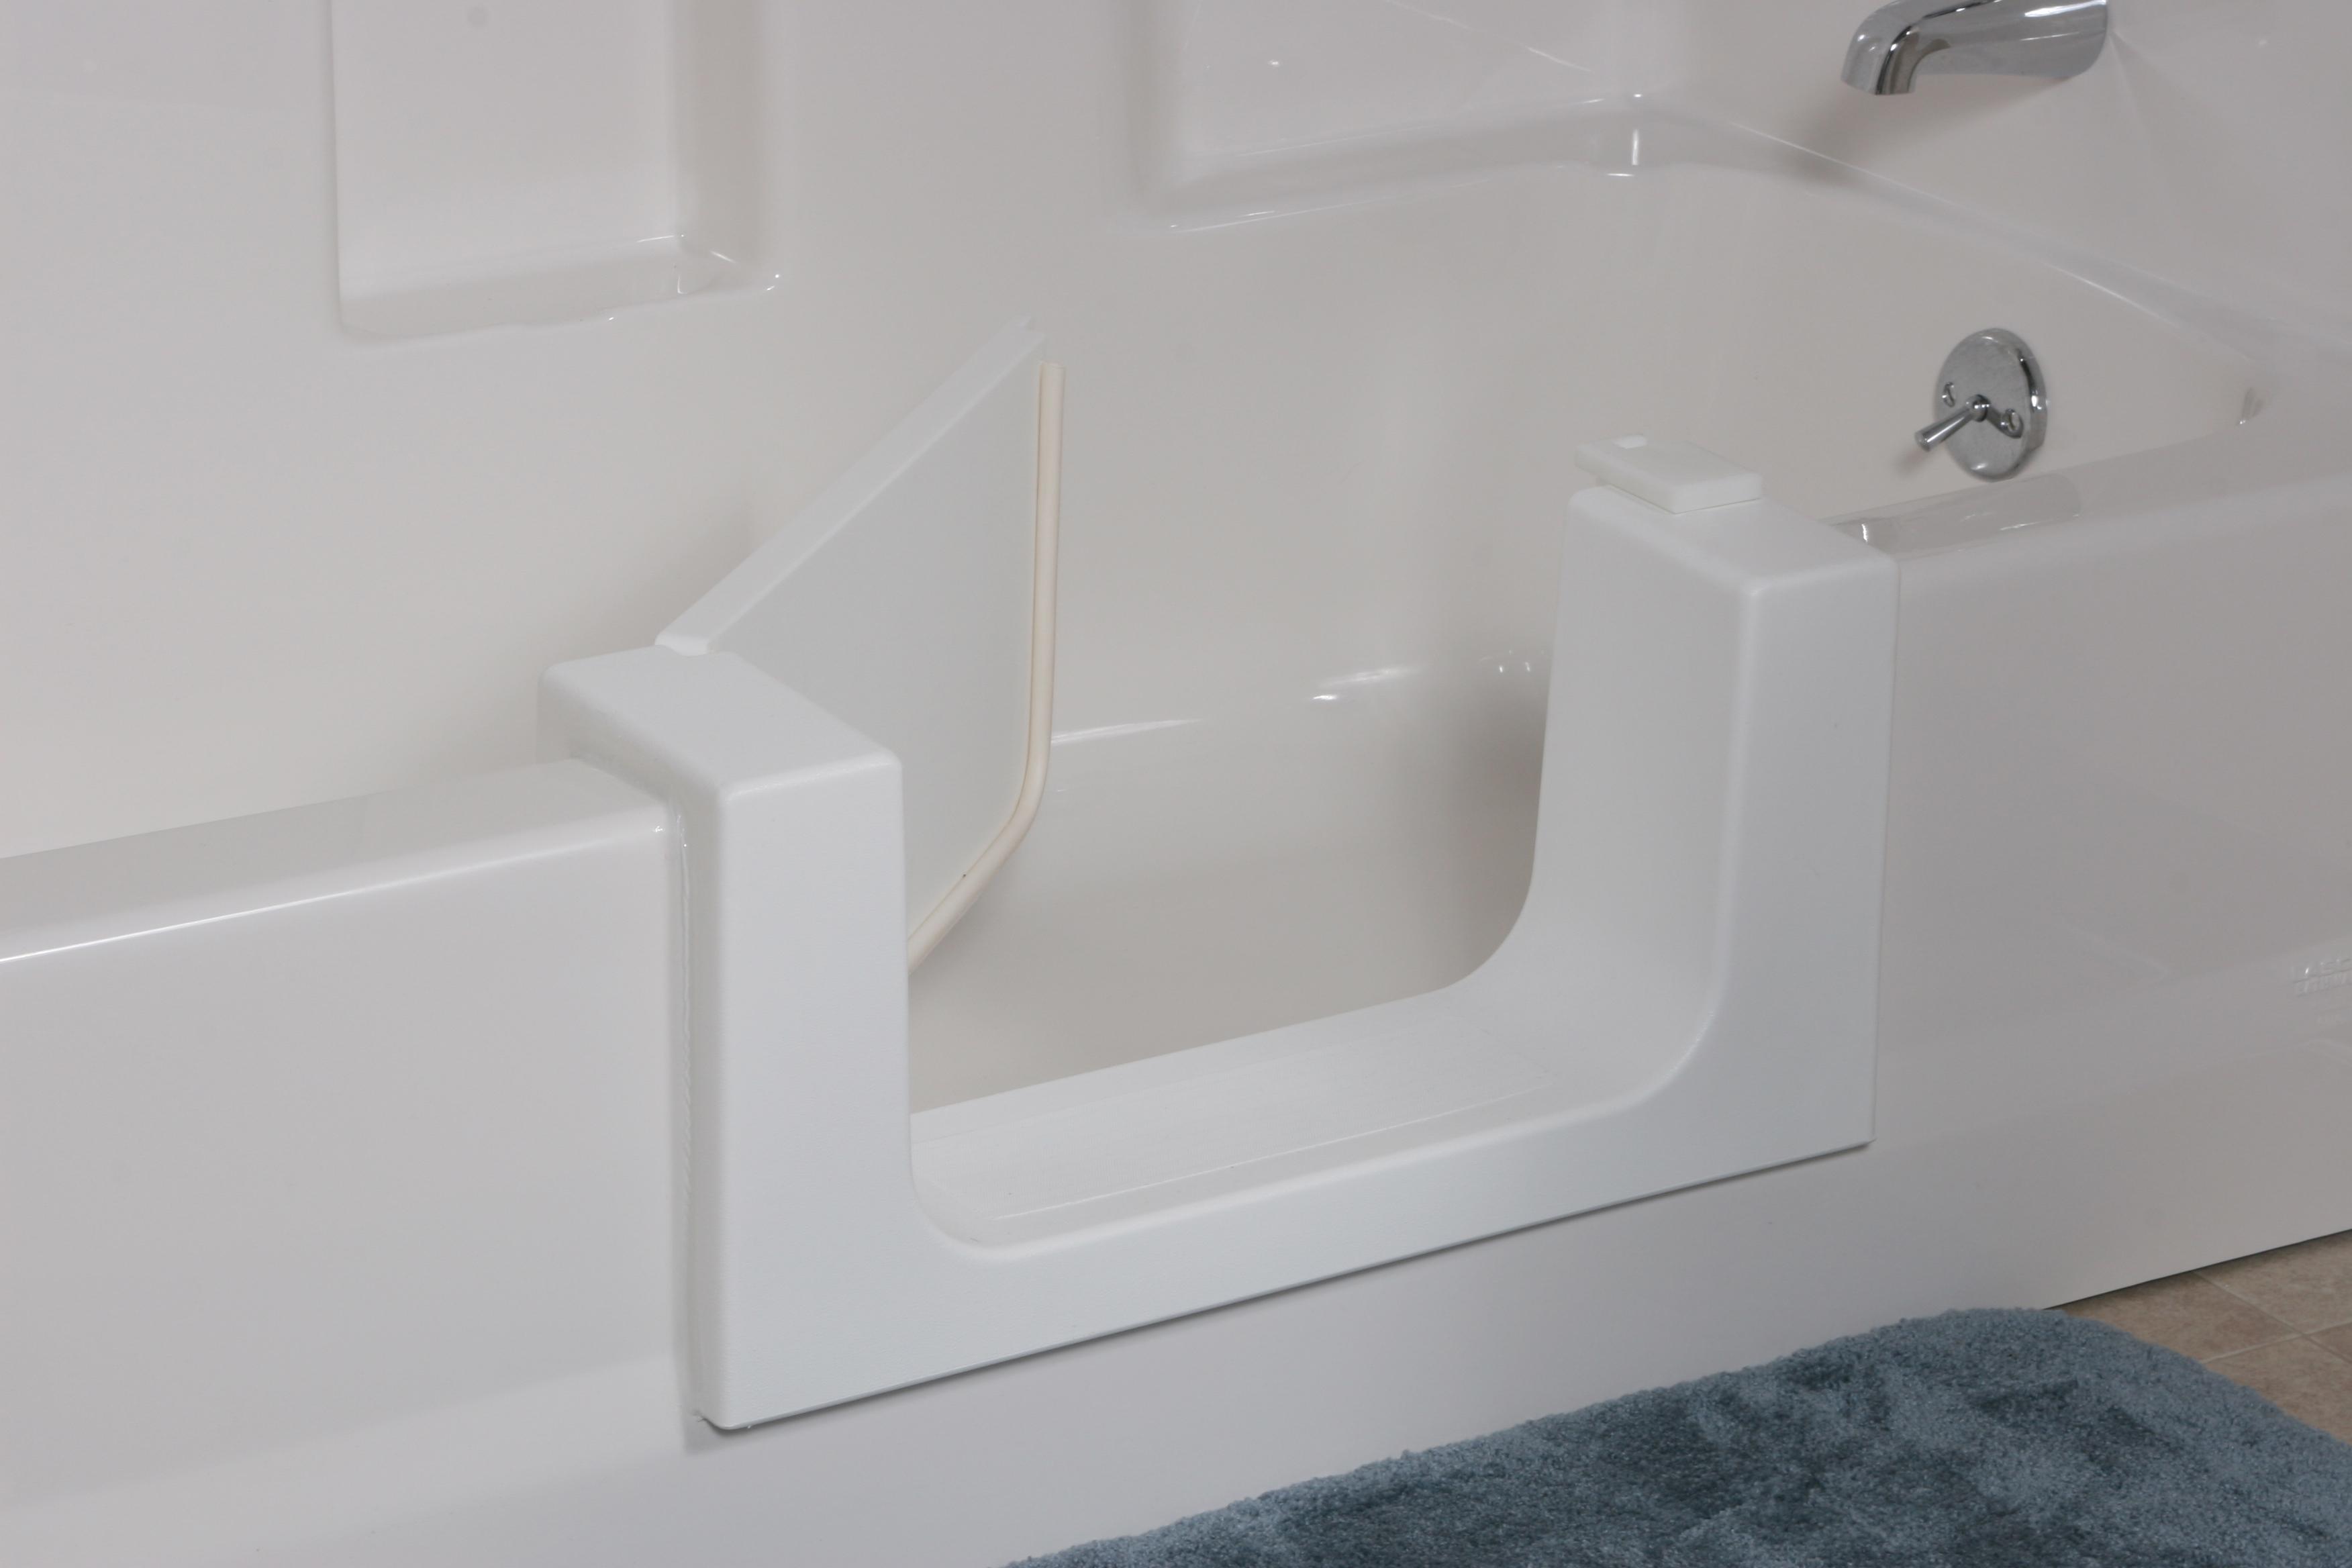 Safeway Tub Door, Add A Watertight Door To Your Existing Bathtub ...